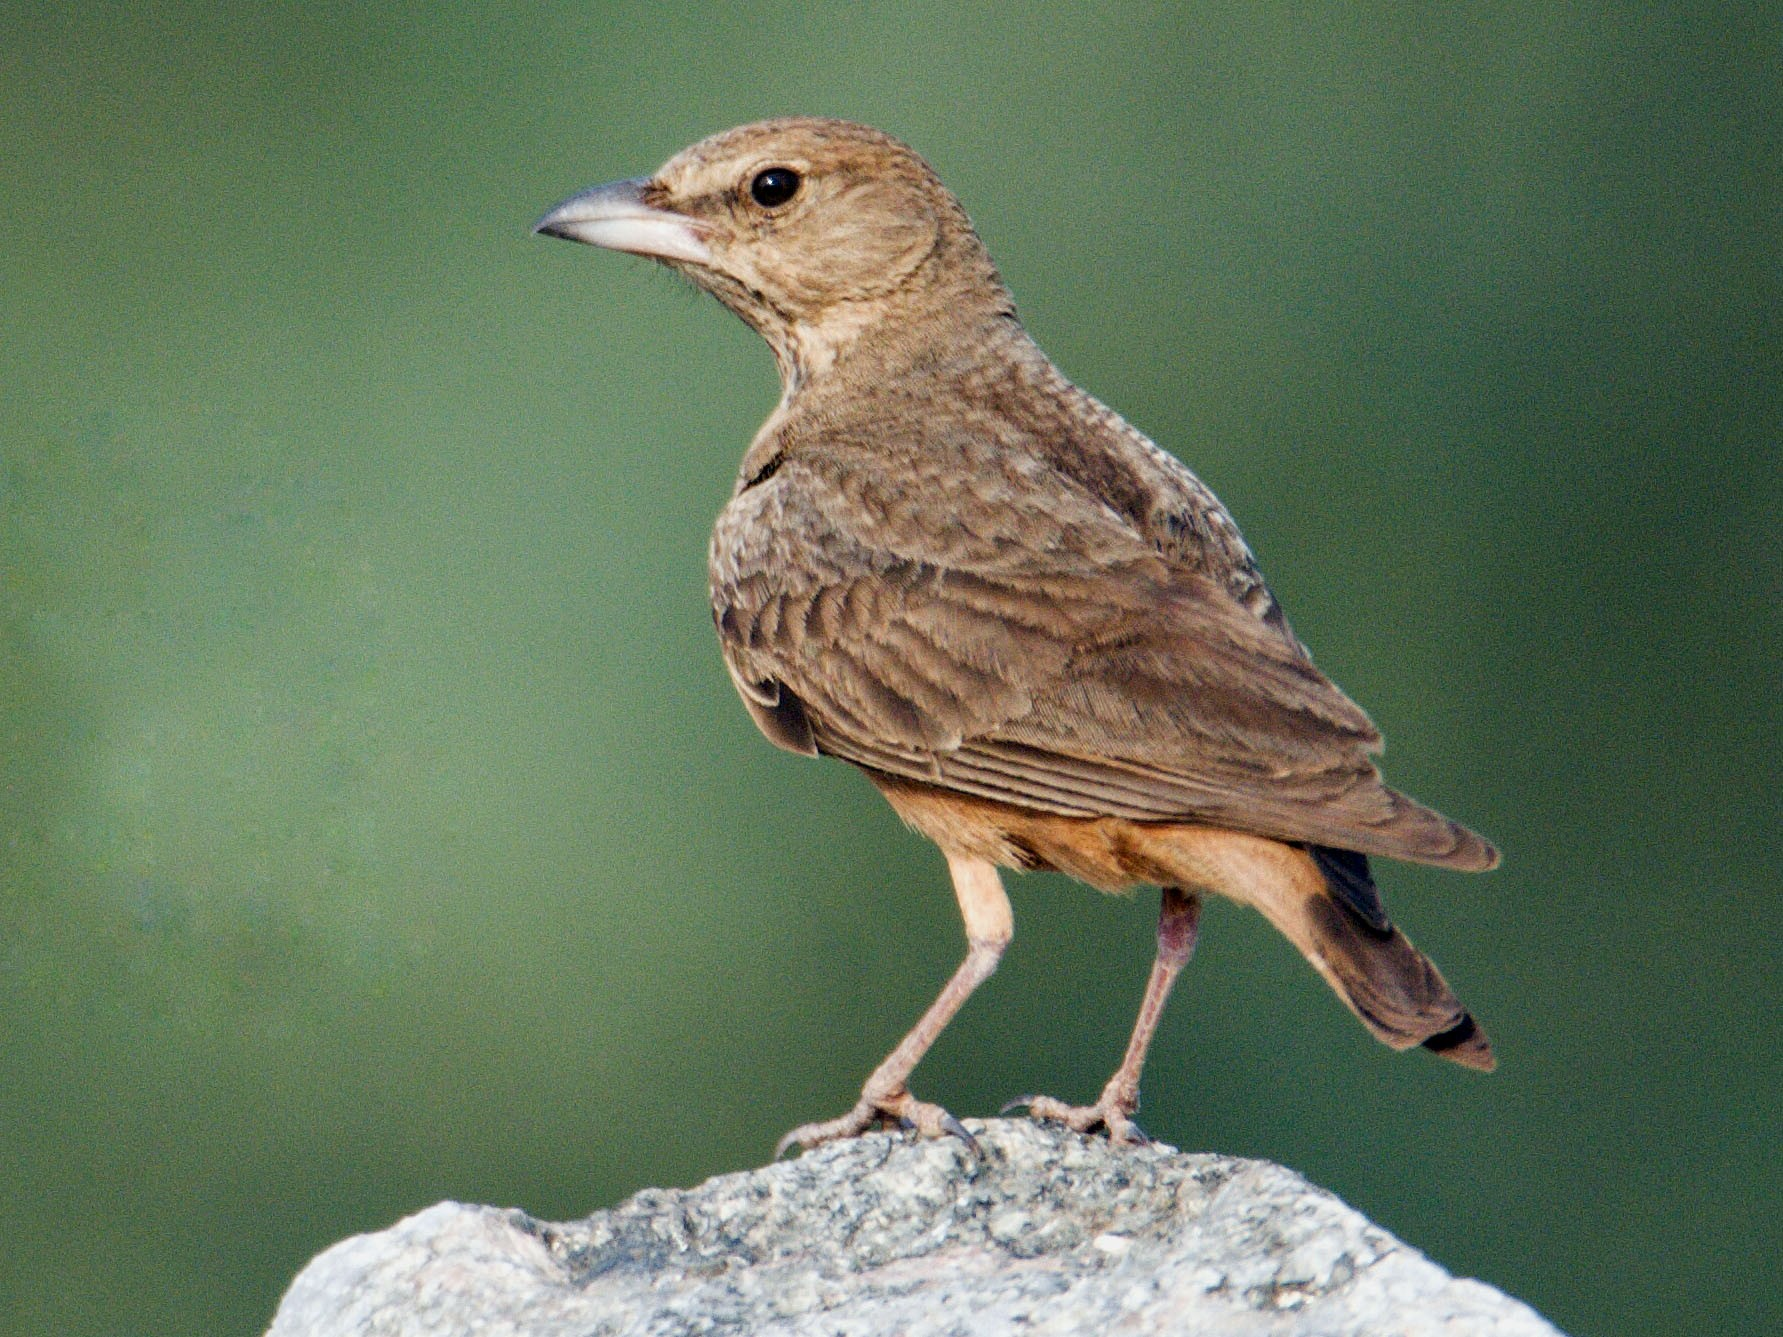 Rufous-tailed Lark - Karthikeyan Ponnambalamoorthy